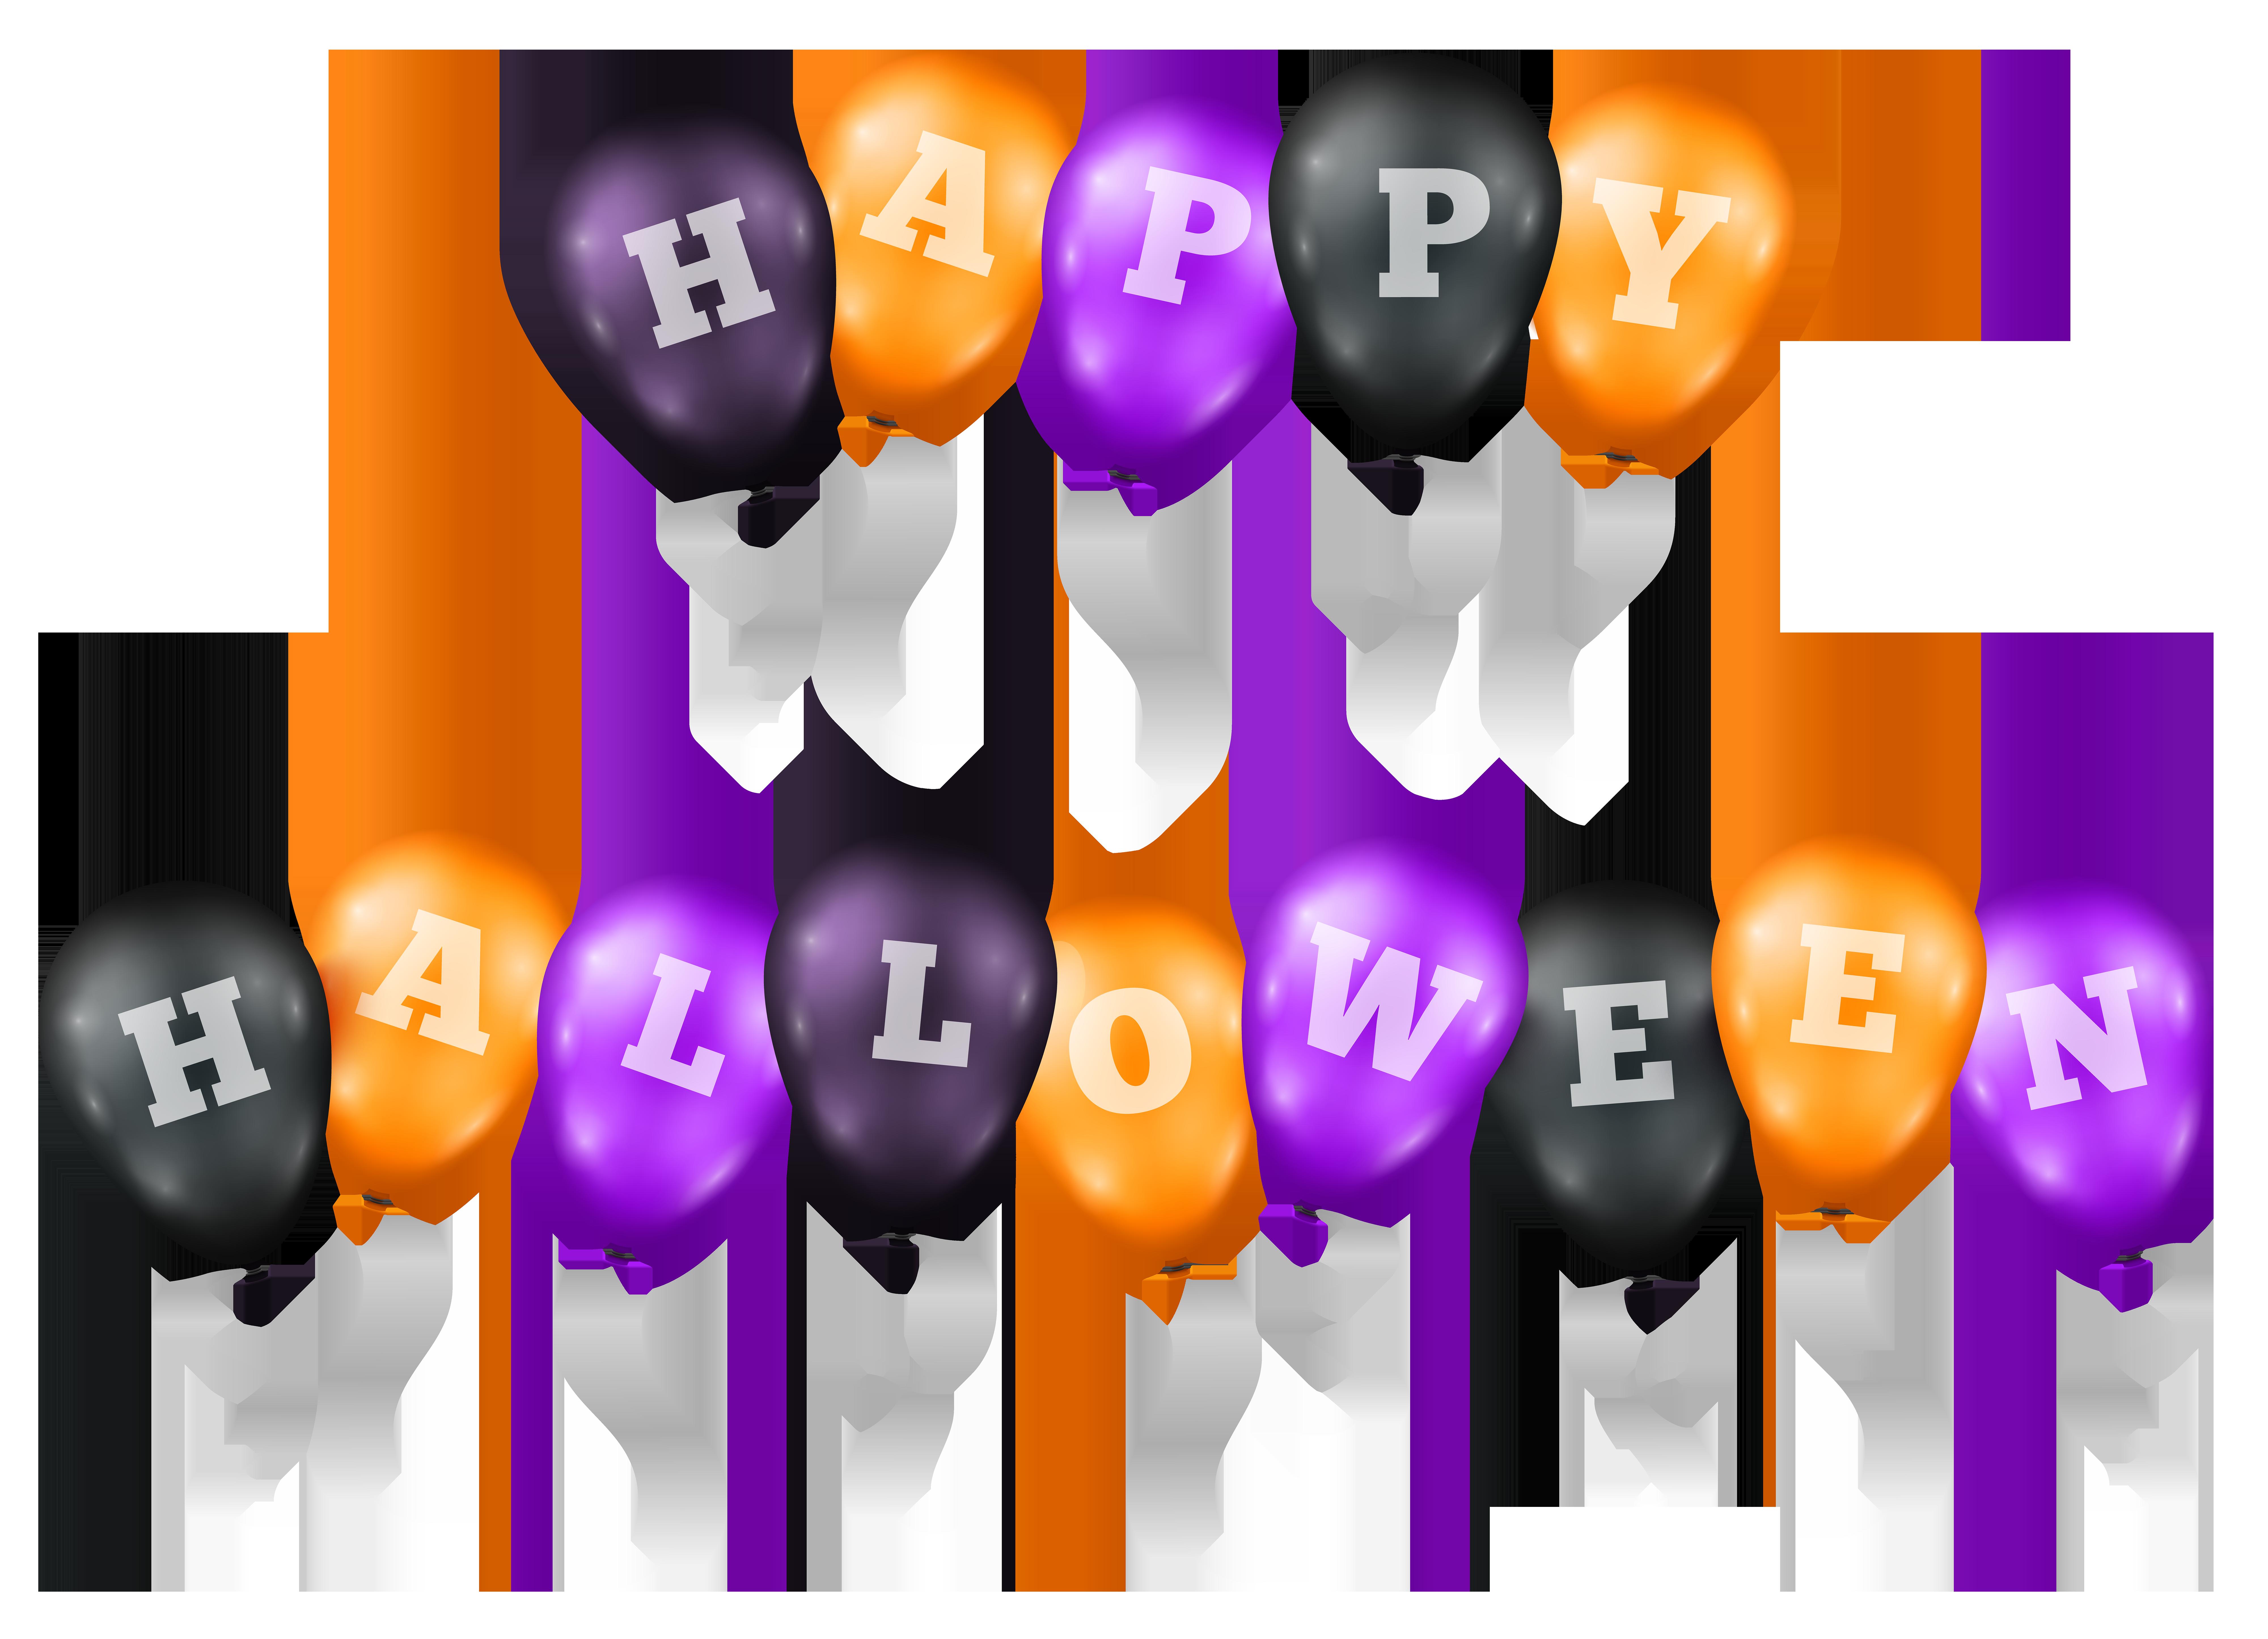 8000x5781 Happy Halloween Balloons Transparent Png Clip Art Imageu200b Gallery